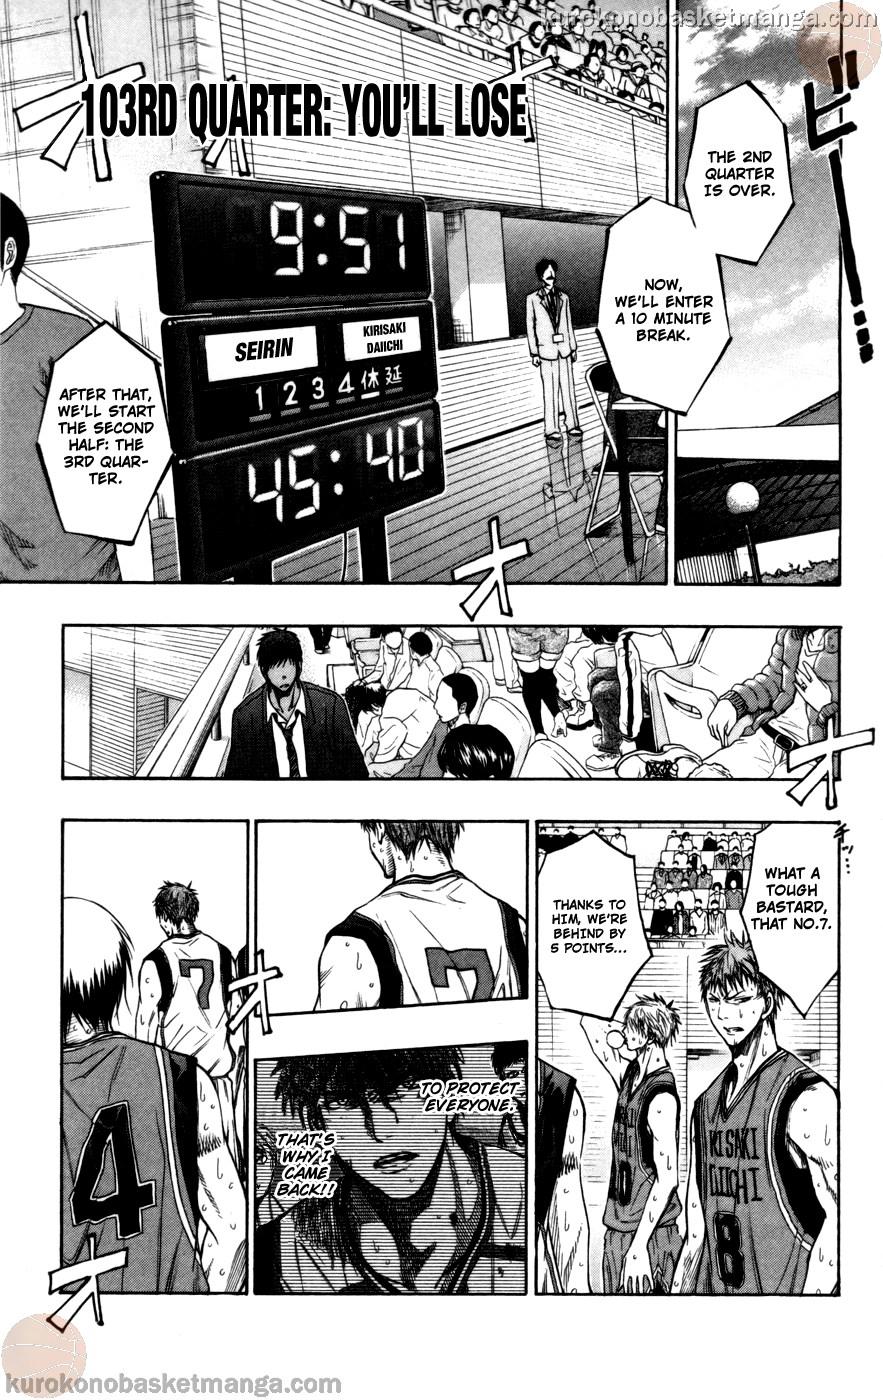 Kuroko no Basket Manga Chapter 103 - Image 01